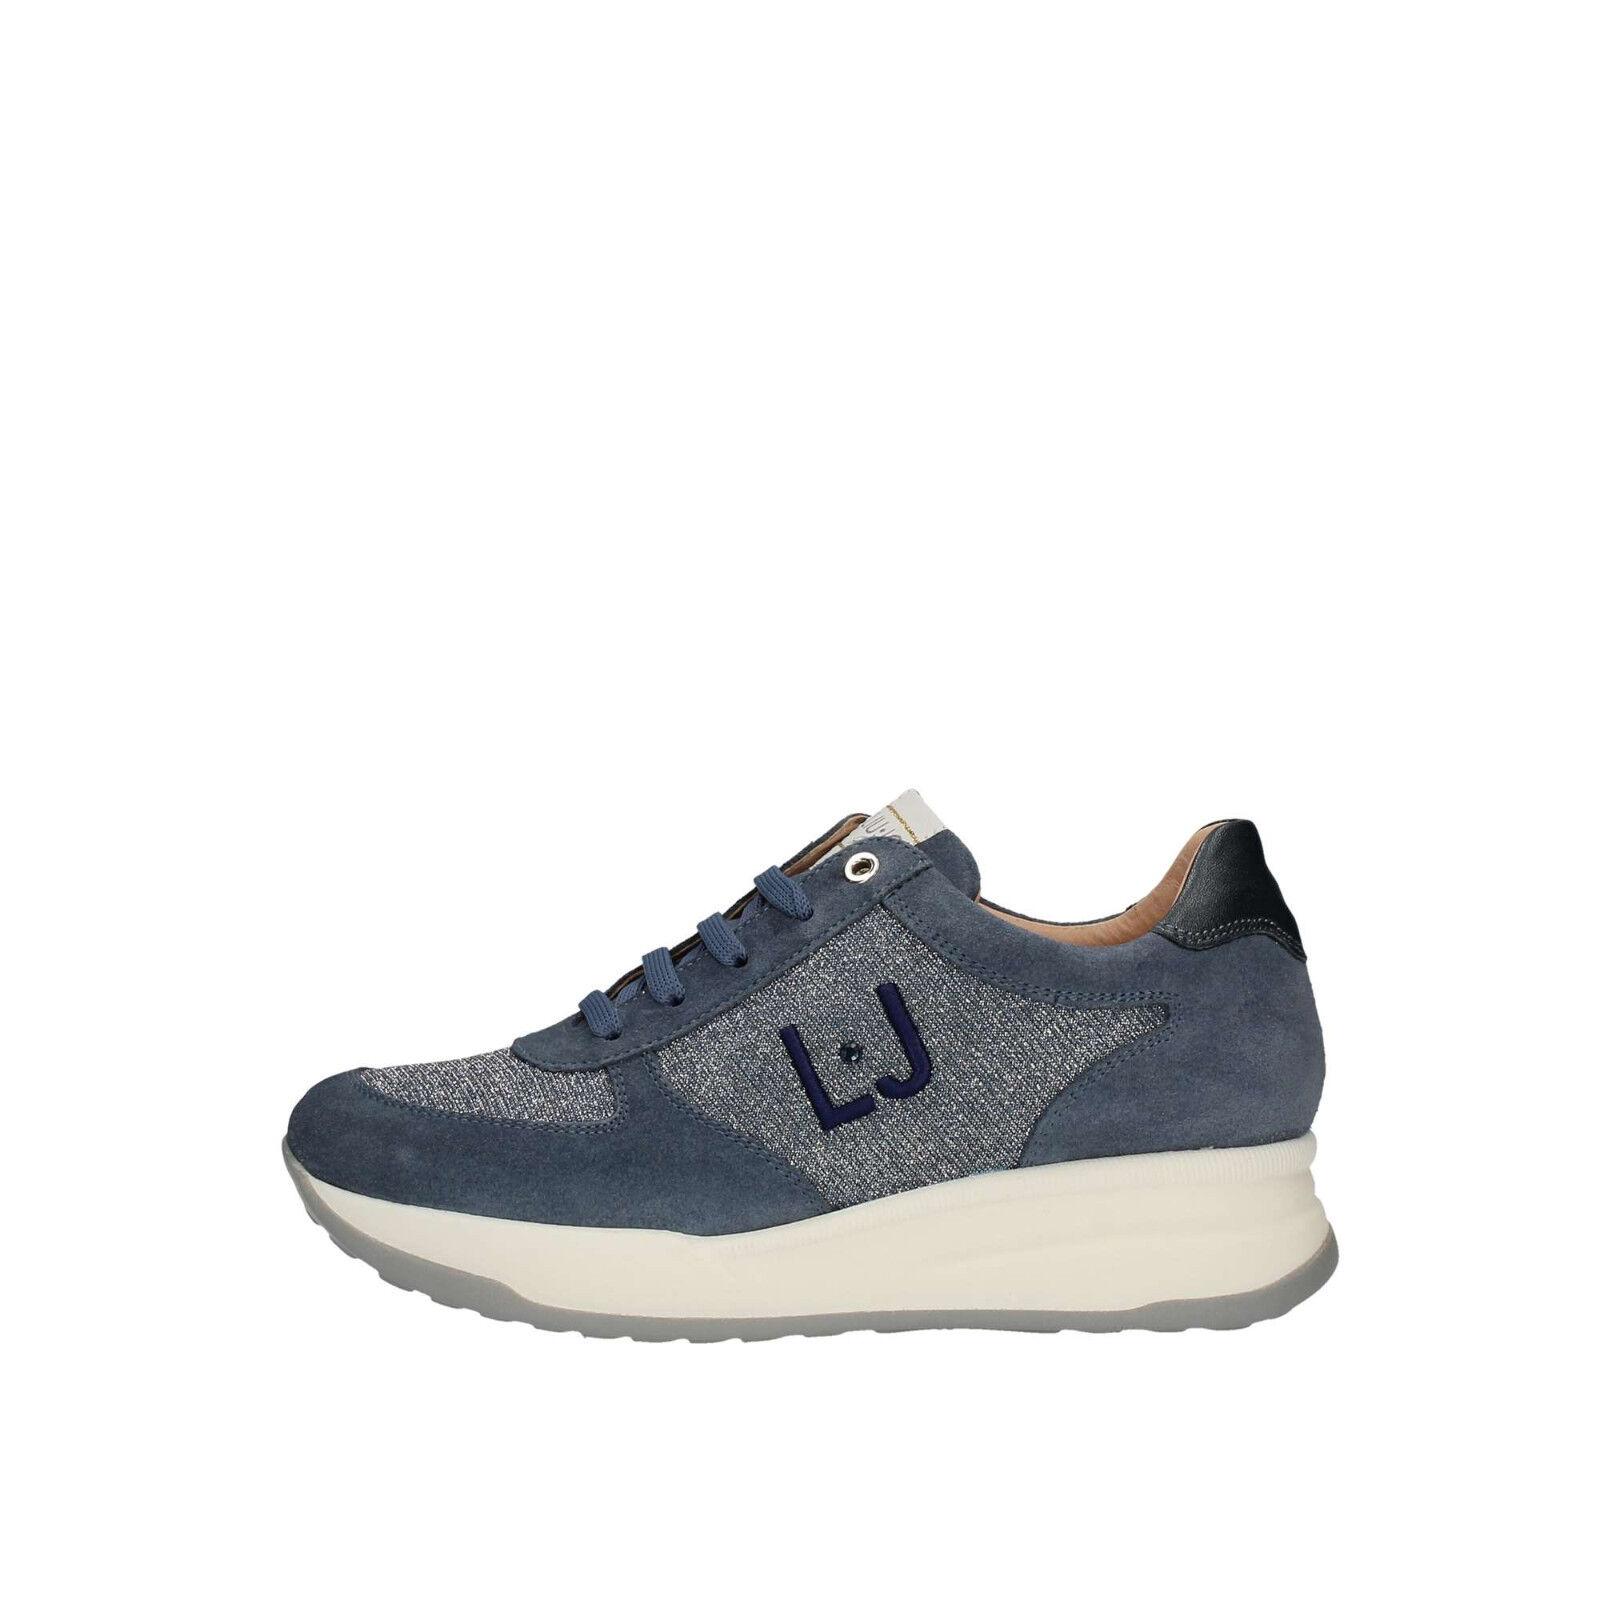 chaussures LIU JO LIUJO GIRL femmes L4A4 00344 0065X087 baskets CAMOSCIO TELA bleu